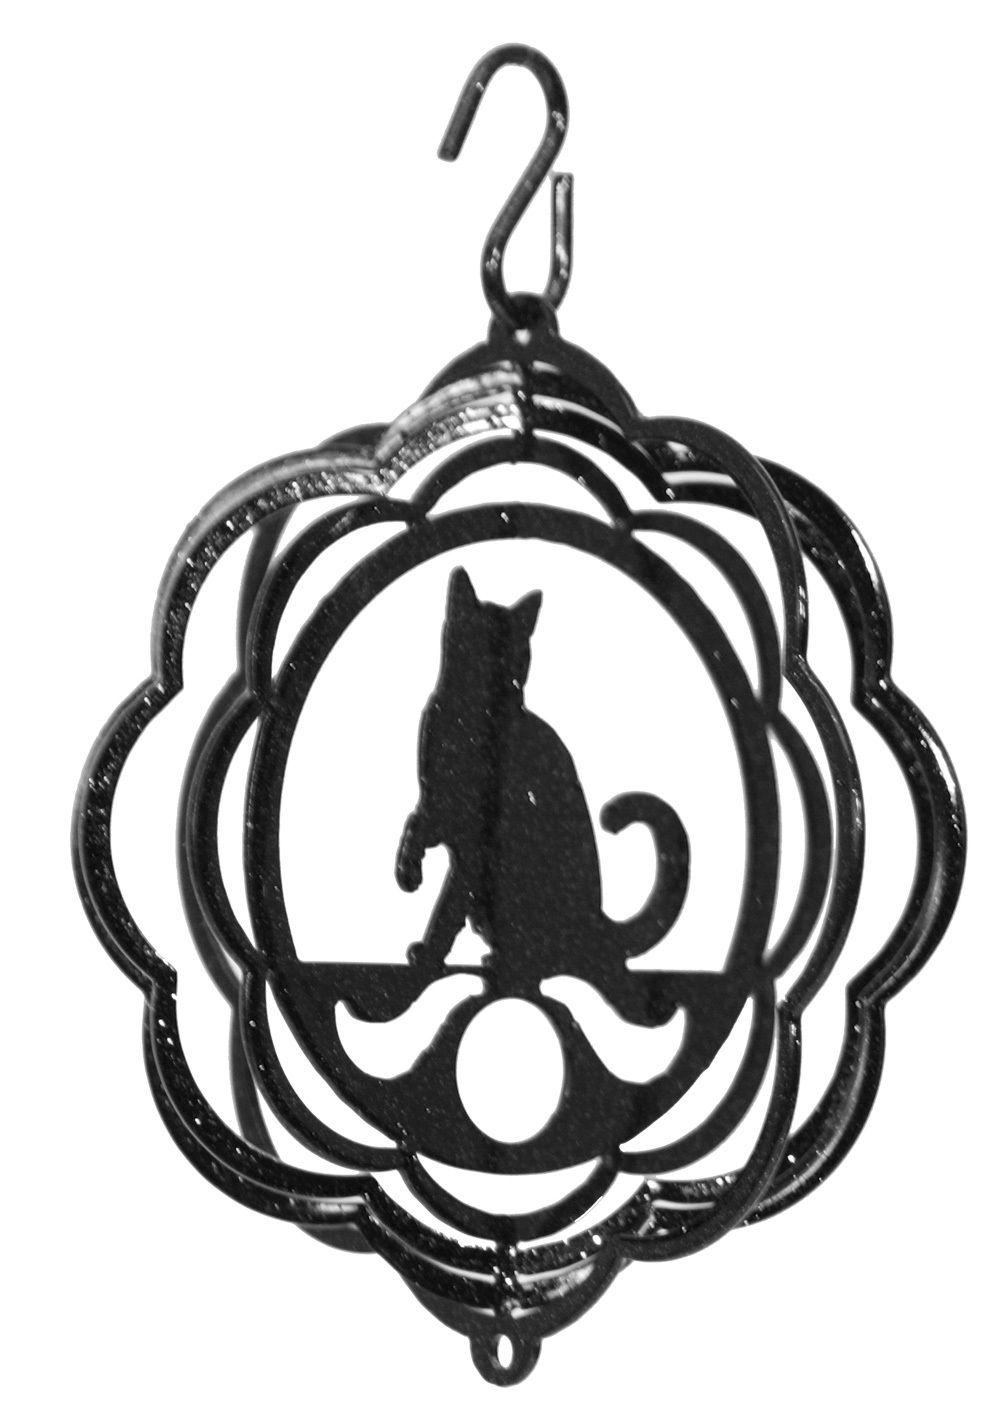 SWEN Products CAT KITTEN Tini Swirly Christmas Tree Ornament | eBay